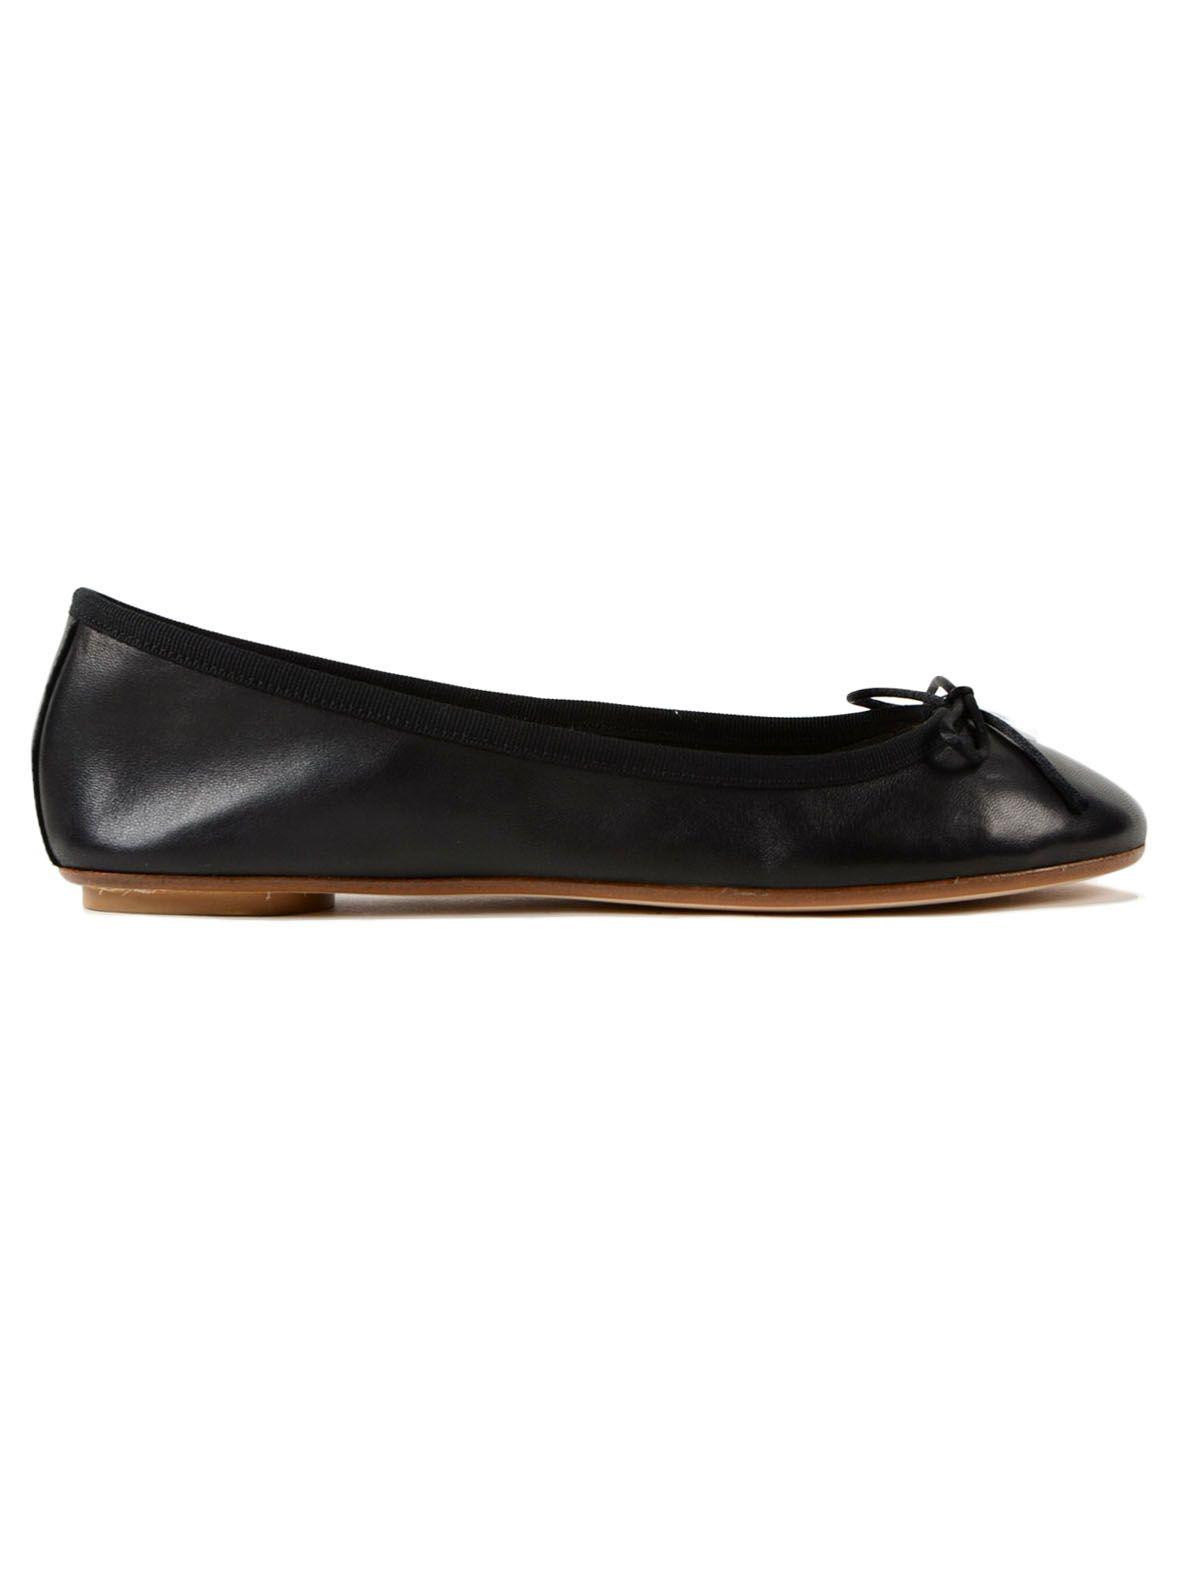 Anna Baiguera Annette Chaussures De Ballerine - Noir J8PL9pqj